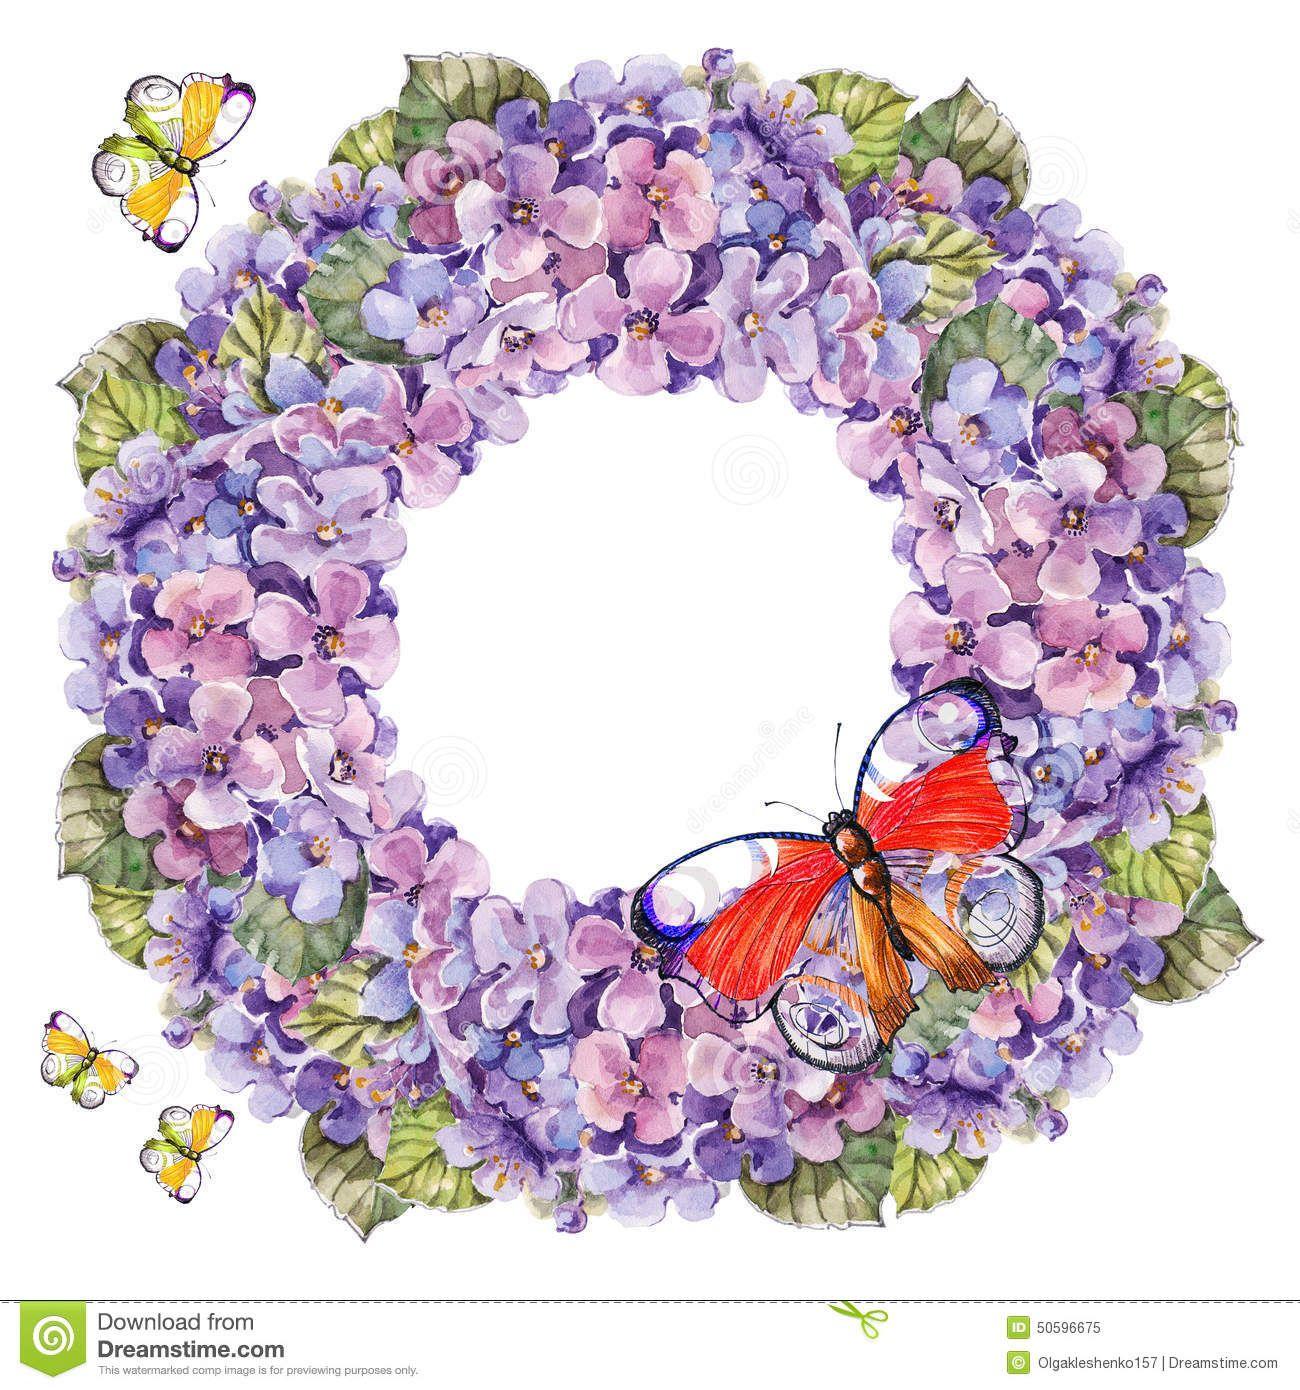 bouquet-hydrangea-flower-garland-butterflies-watercolor-handmade-white-background-50596675.jpg (1300×1390)